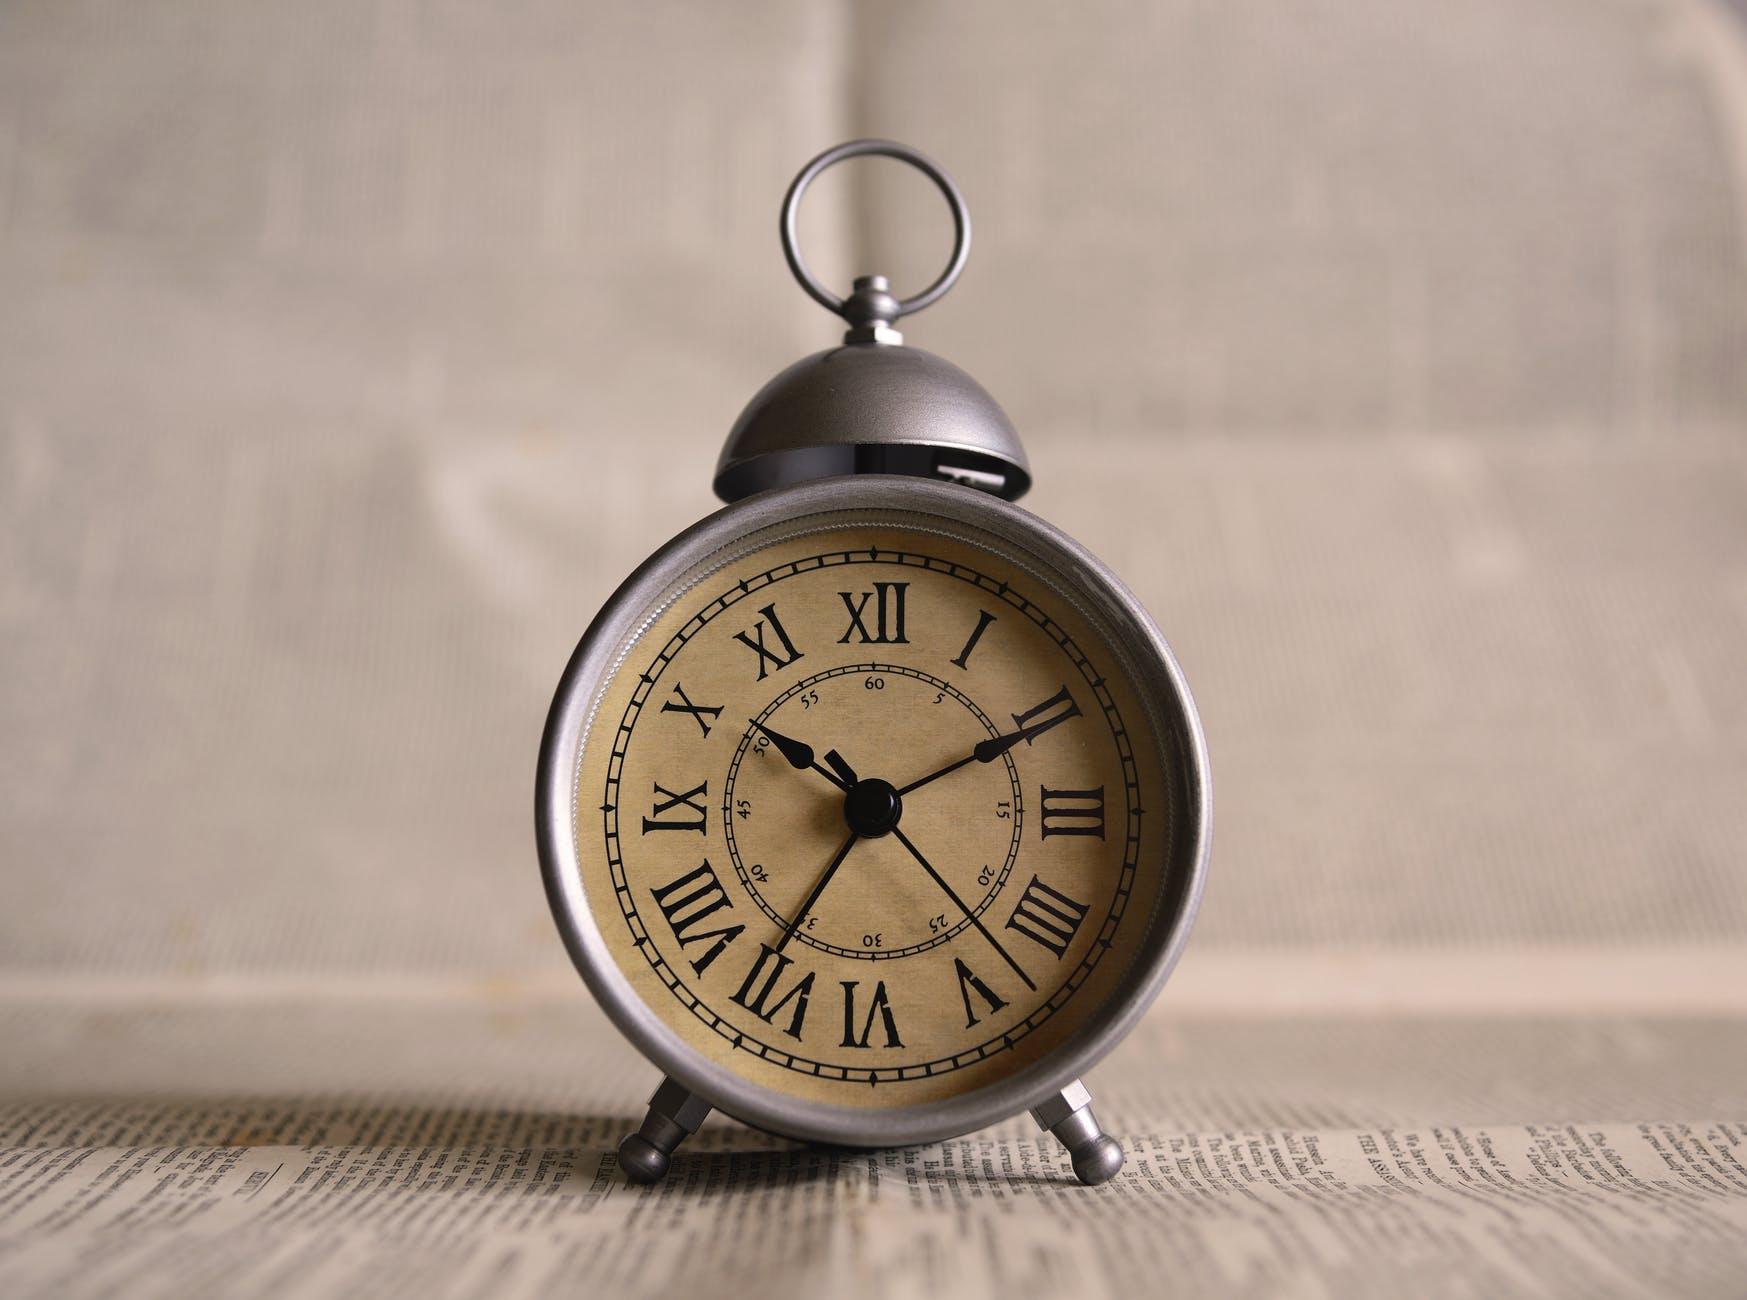 6 writing tips from writers, blog post, writers, writing, writing tips, writing hacks, writing advice, time, clock, alarm clock, old fashioned alarm clock, blog, how to be a better writer, writers' advice, authors' advice, aspasiasbissas.com